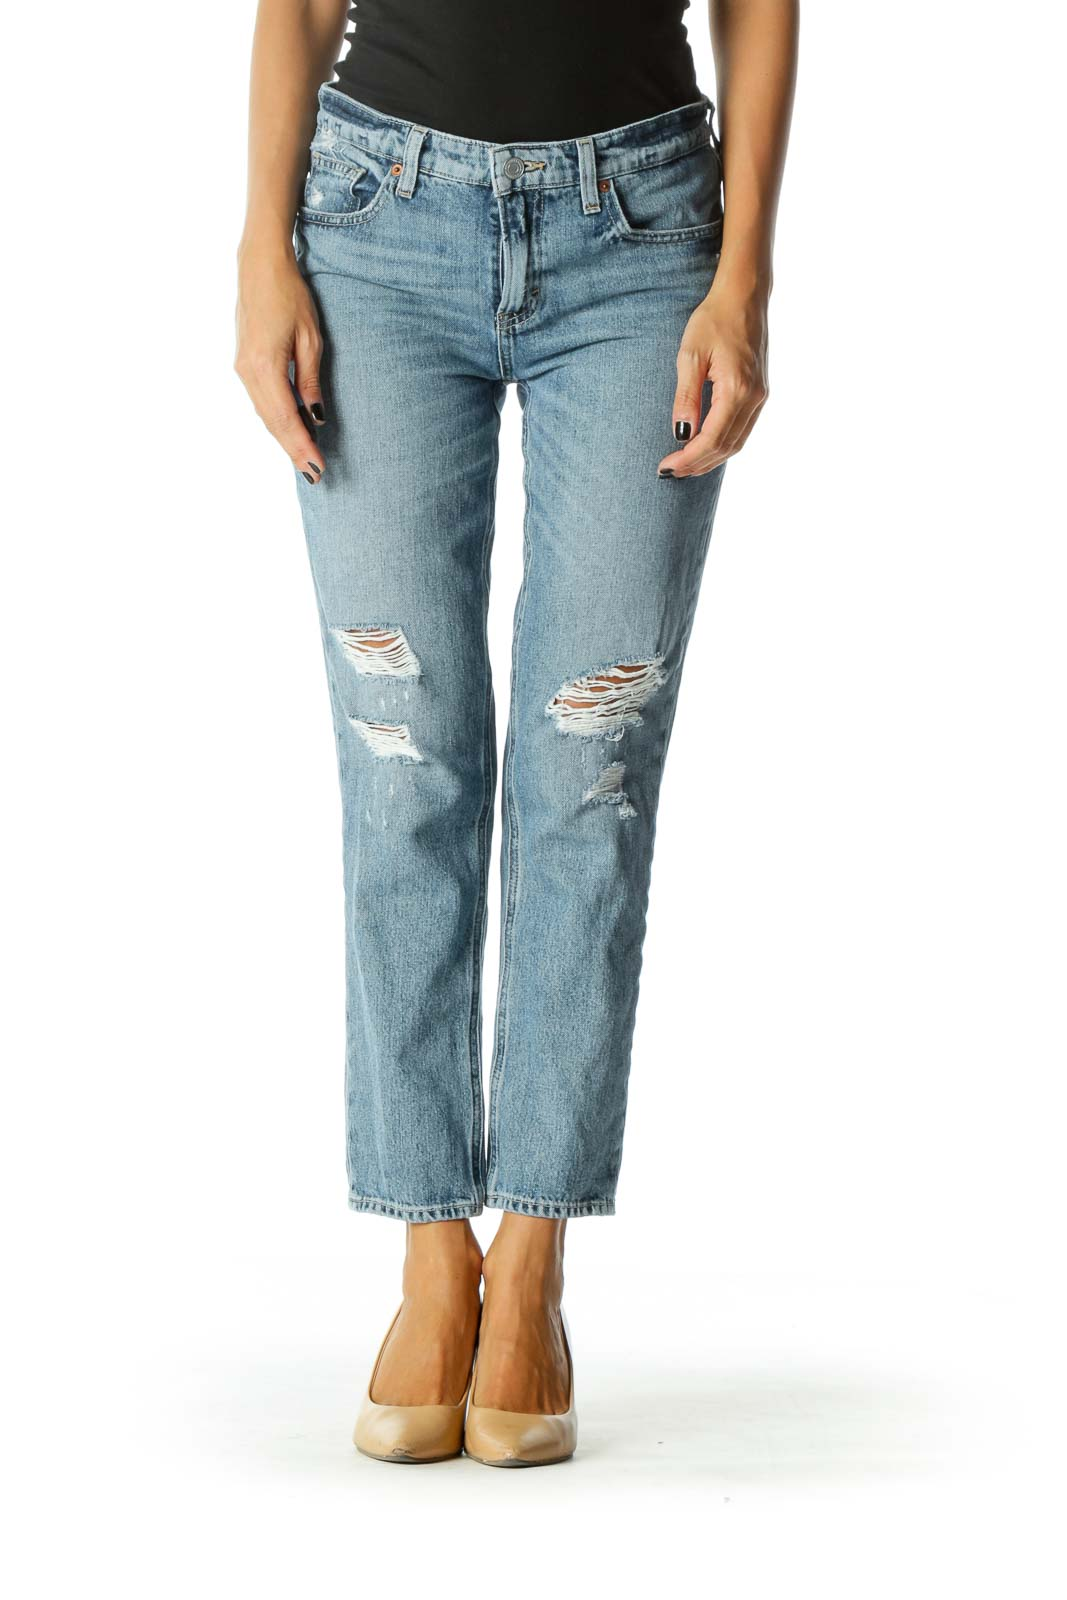 Blue Light Wash Distressed Skinny Denim Jeans